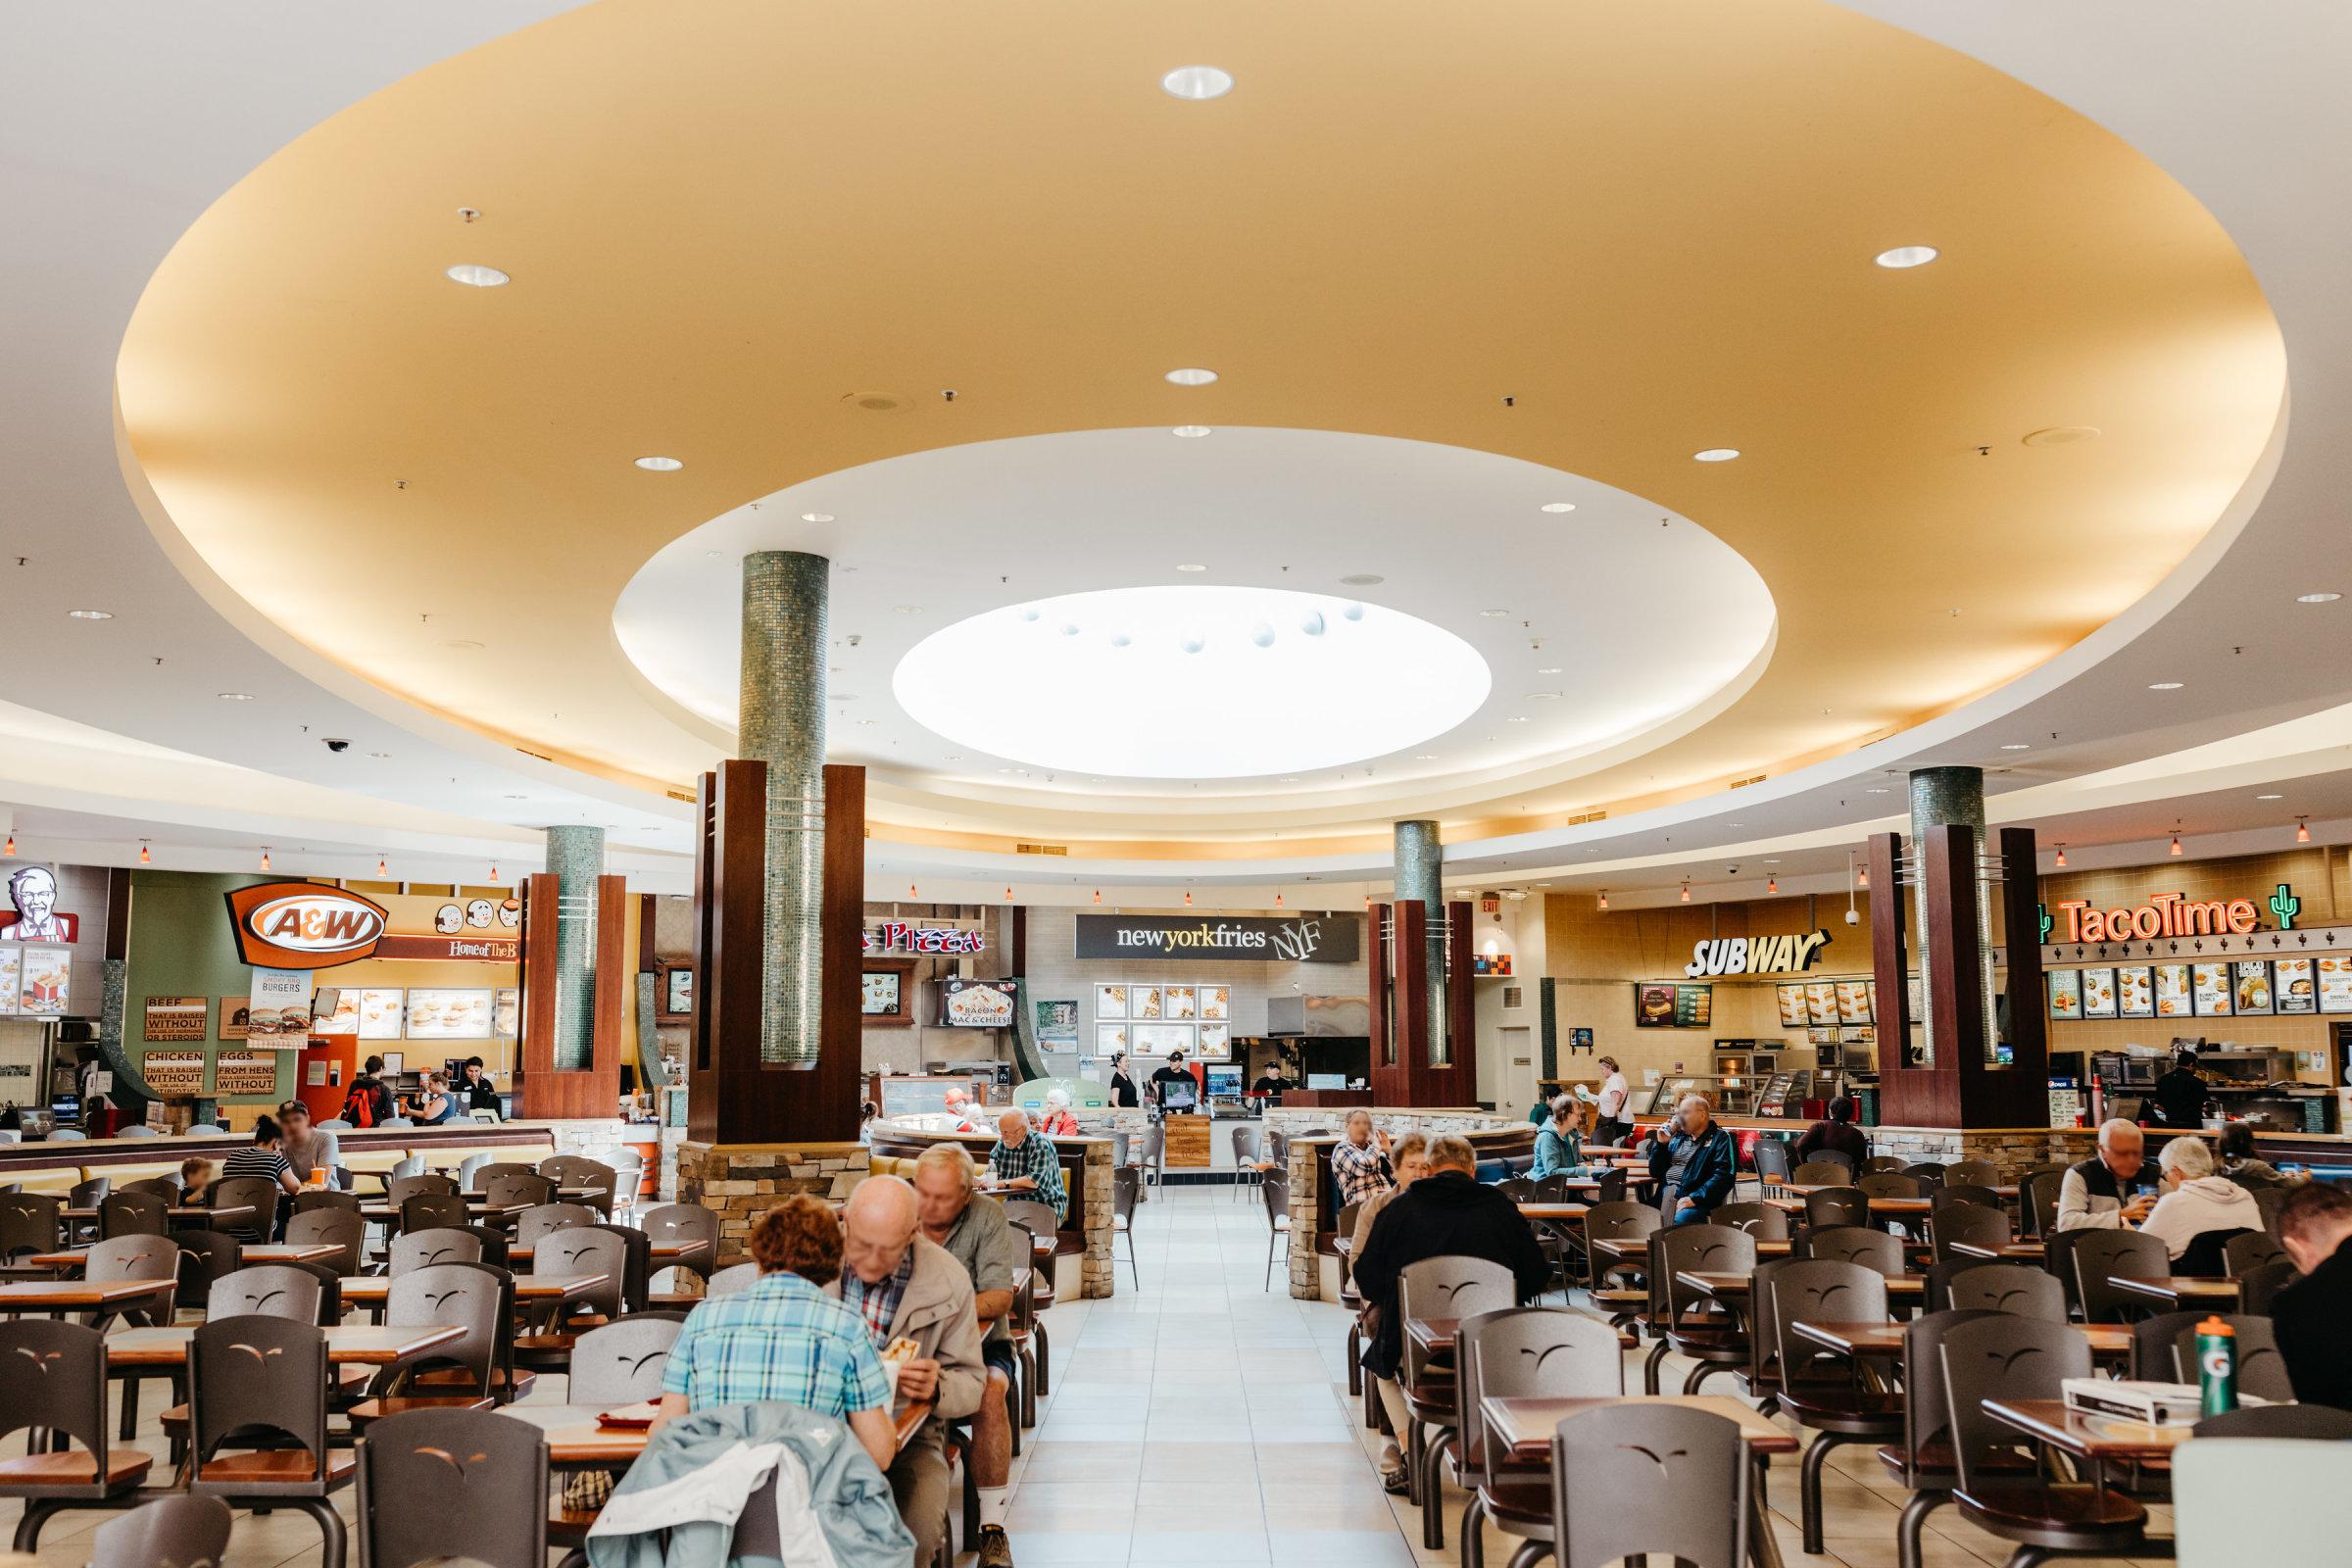 mayfair mall - photo #28